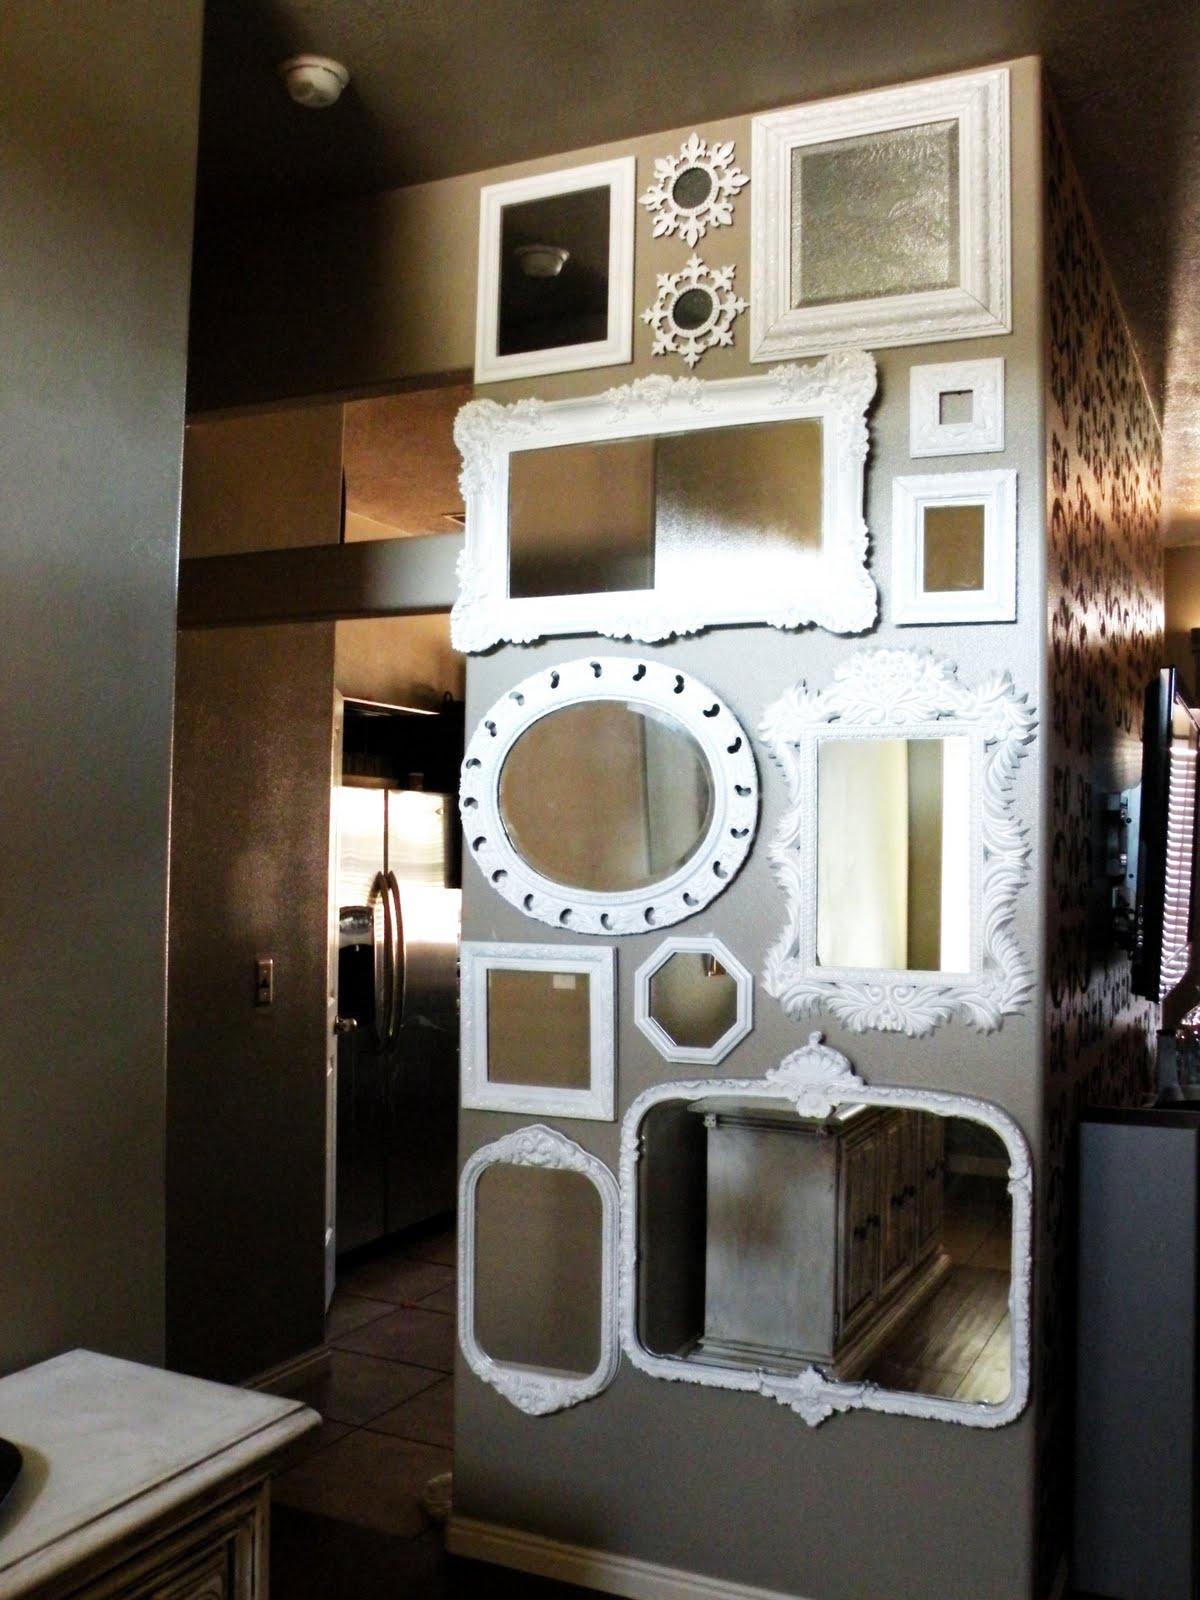 http://2.bp.blogspot.com/_schtd5RphwI/TFimReW-9jI/AAAAAAAABkw/tYX8dzXRf6s/s1600/Wall+O+Mirrors.jpg